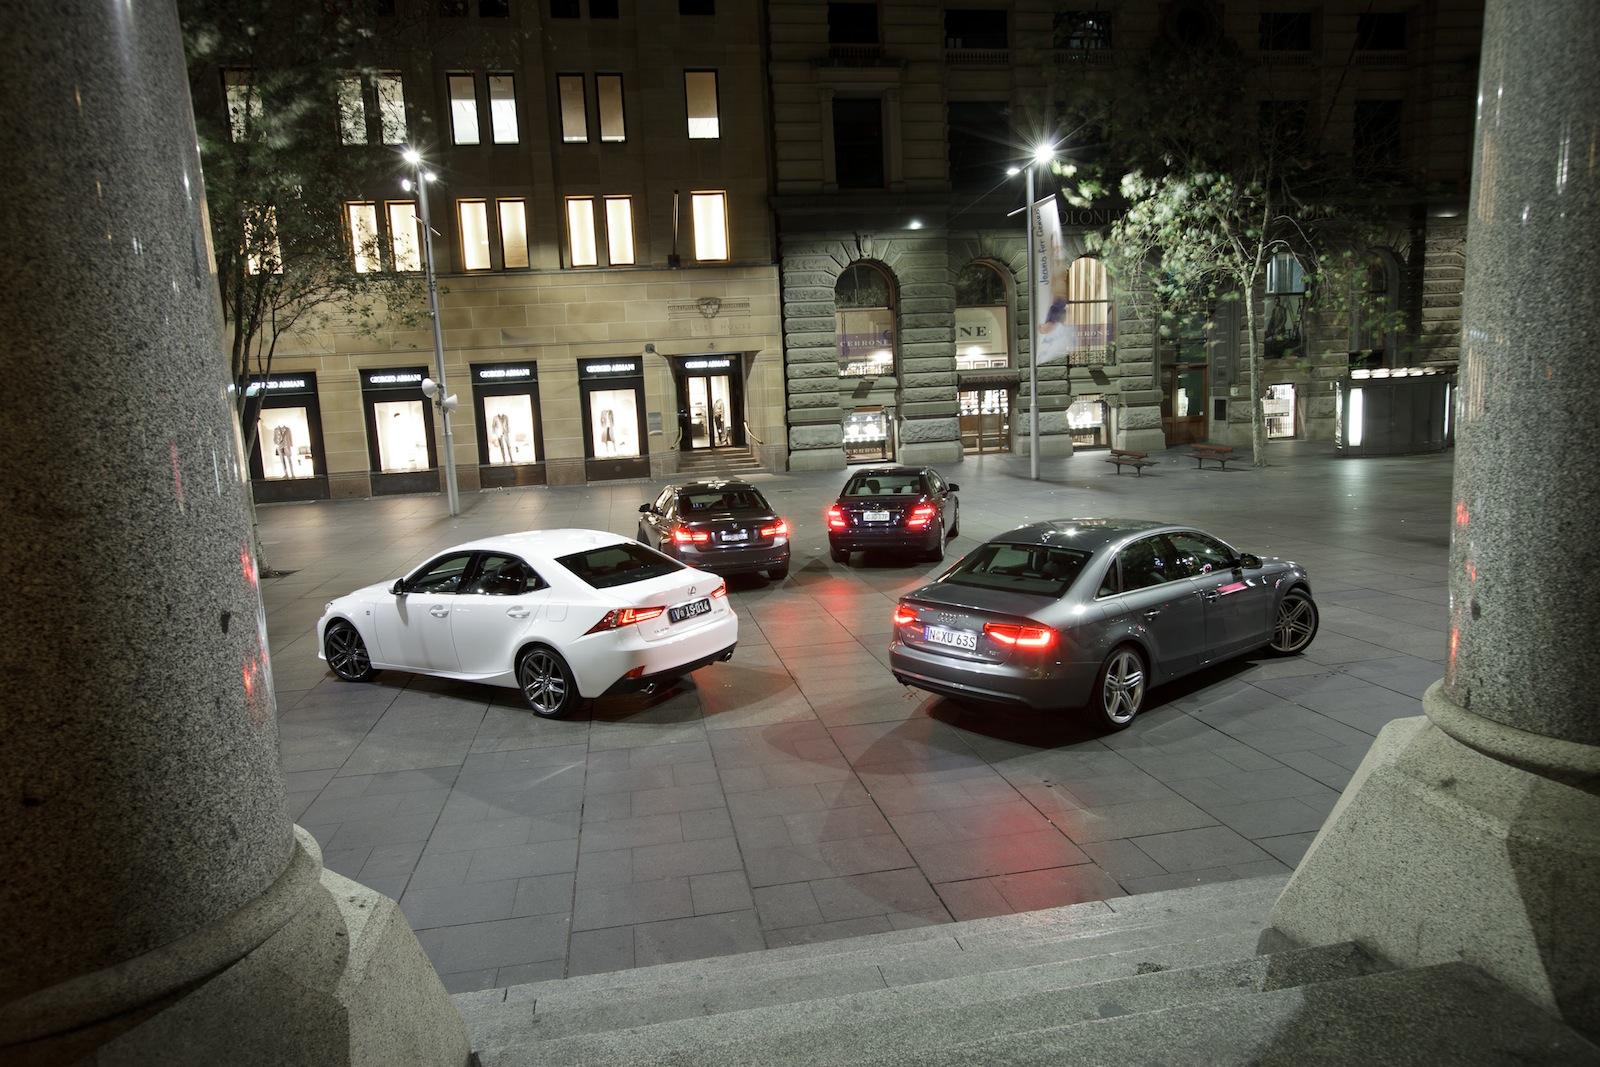 bmw 320i vs audi a4 Review terlengkap mobil mercedez benz c200 vs avantgarde vs bmw 320i sports vs audi a4 18 tfsireview mobil keren terbaru.